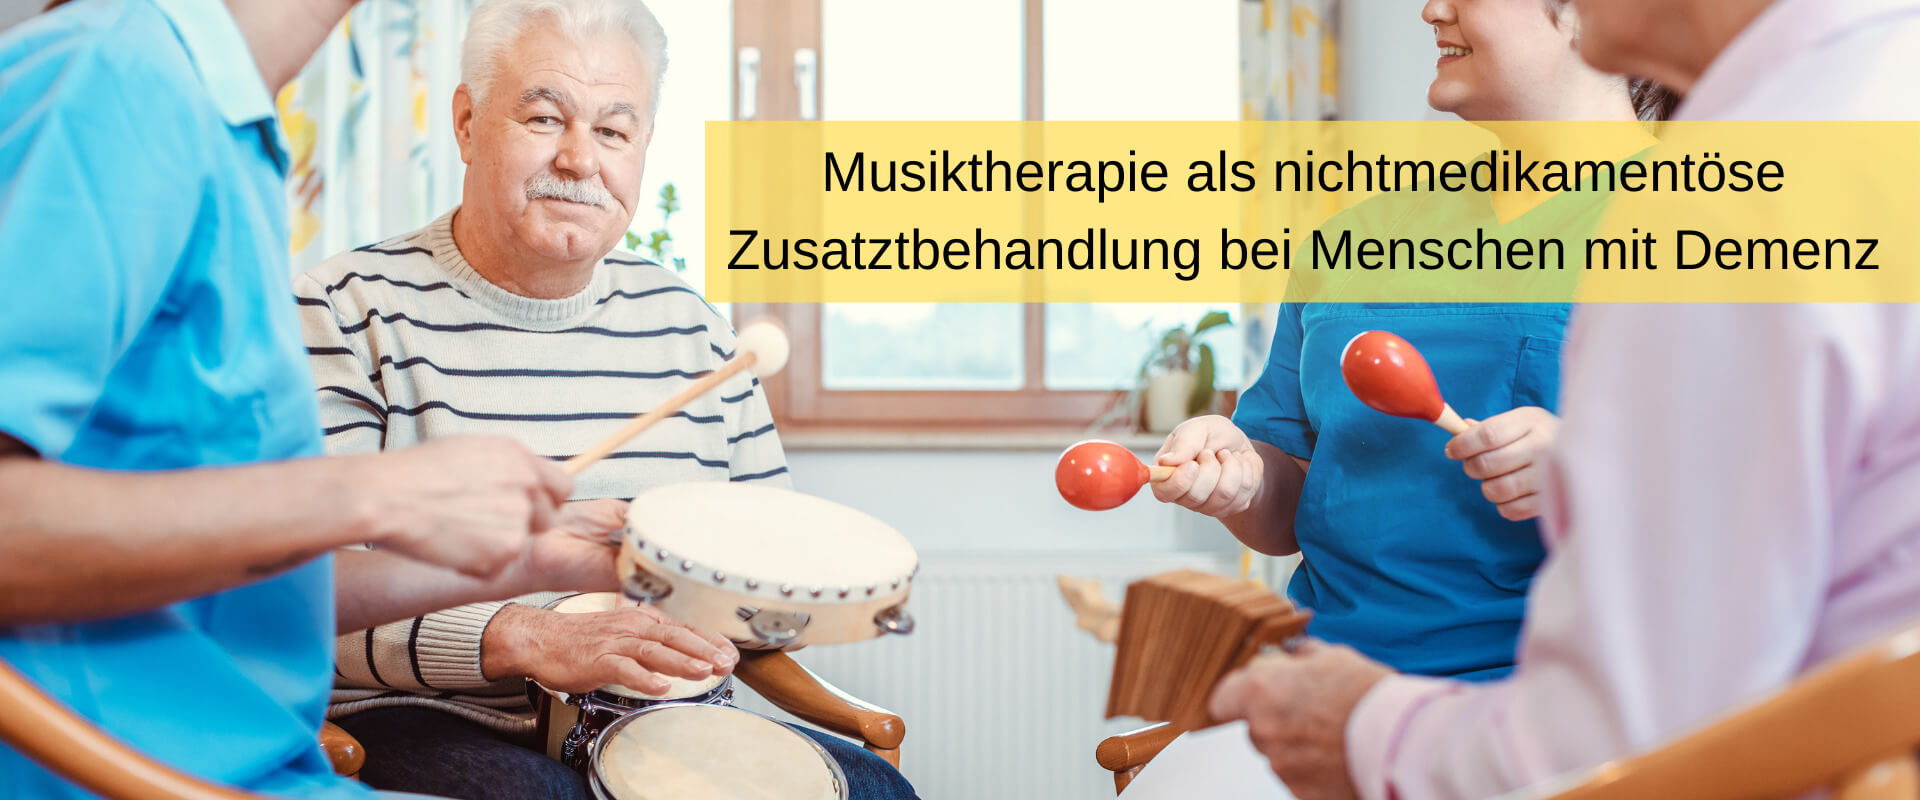 Musiktherapie Demenz